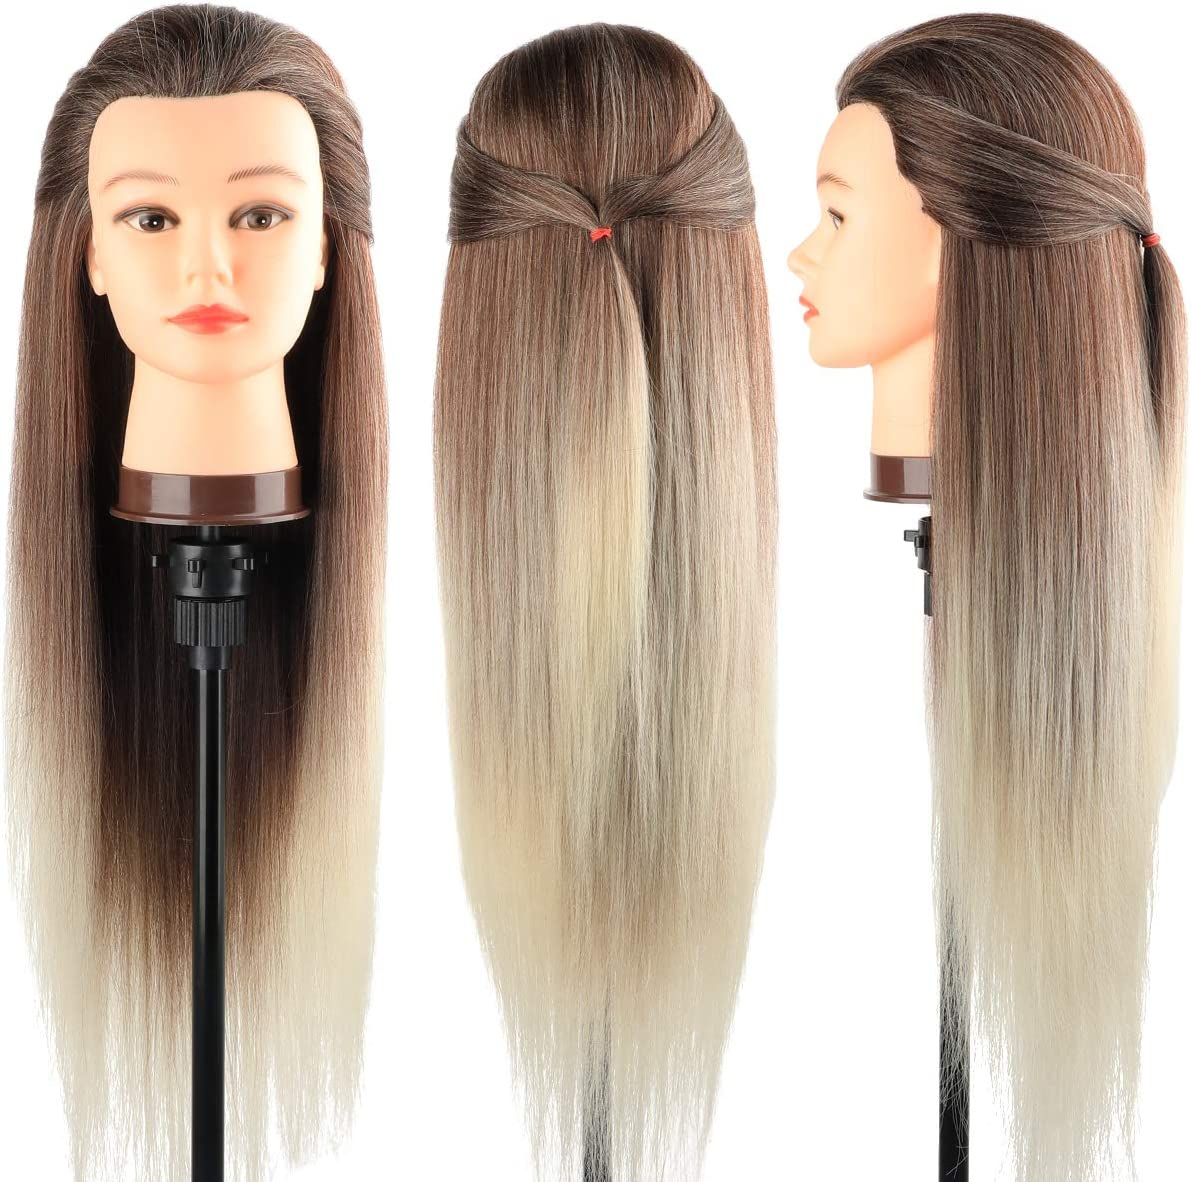 Cabeza maniquí, DanseeMeibr 66cm cabeza peluqueria Practicas Formación de la Cosmetología para trenza 100% de cabello sintéticas, cabeza de muñeca con Soporte de Mesa + Accesorios de Peinado C